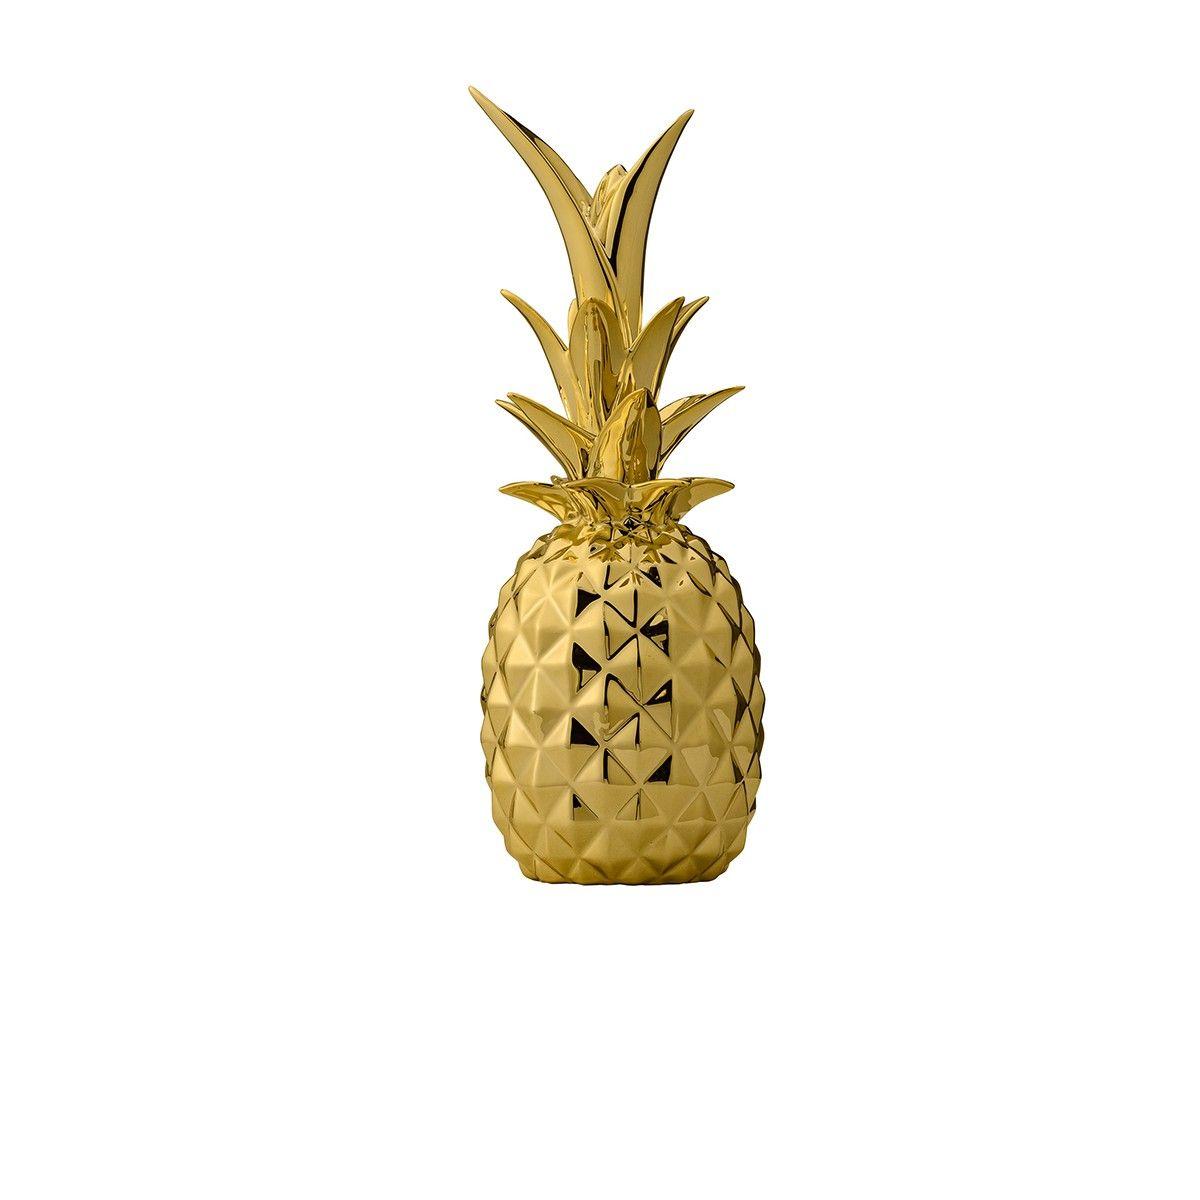 ananas d coratif dor bloomingville gold pineapple ornament gold pineapple et. Black Bedroom Furniture Sets. Home Design Ideas